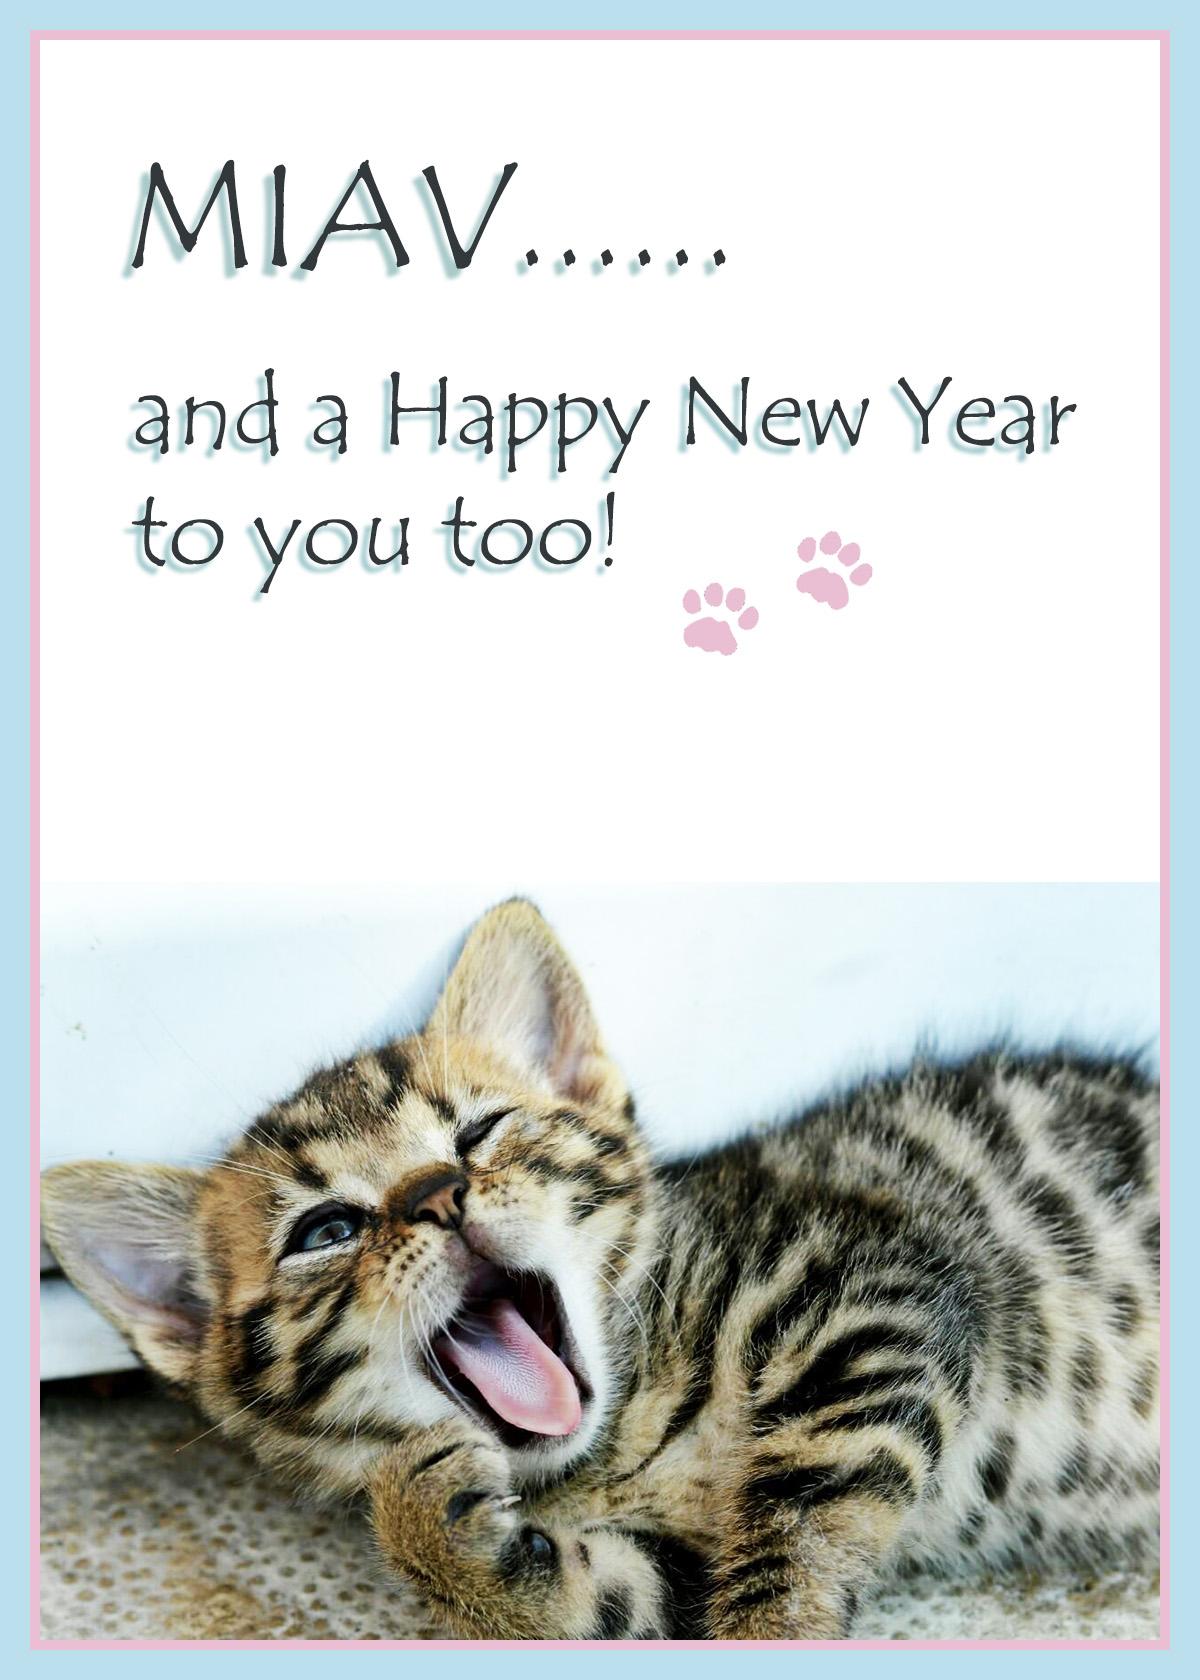 Sleepy kitten wishing you a happy New Year